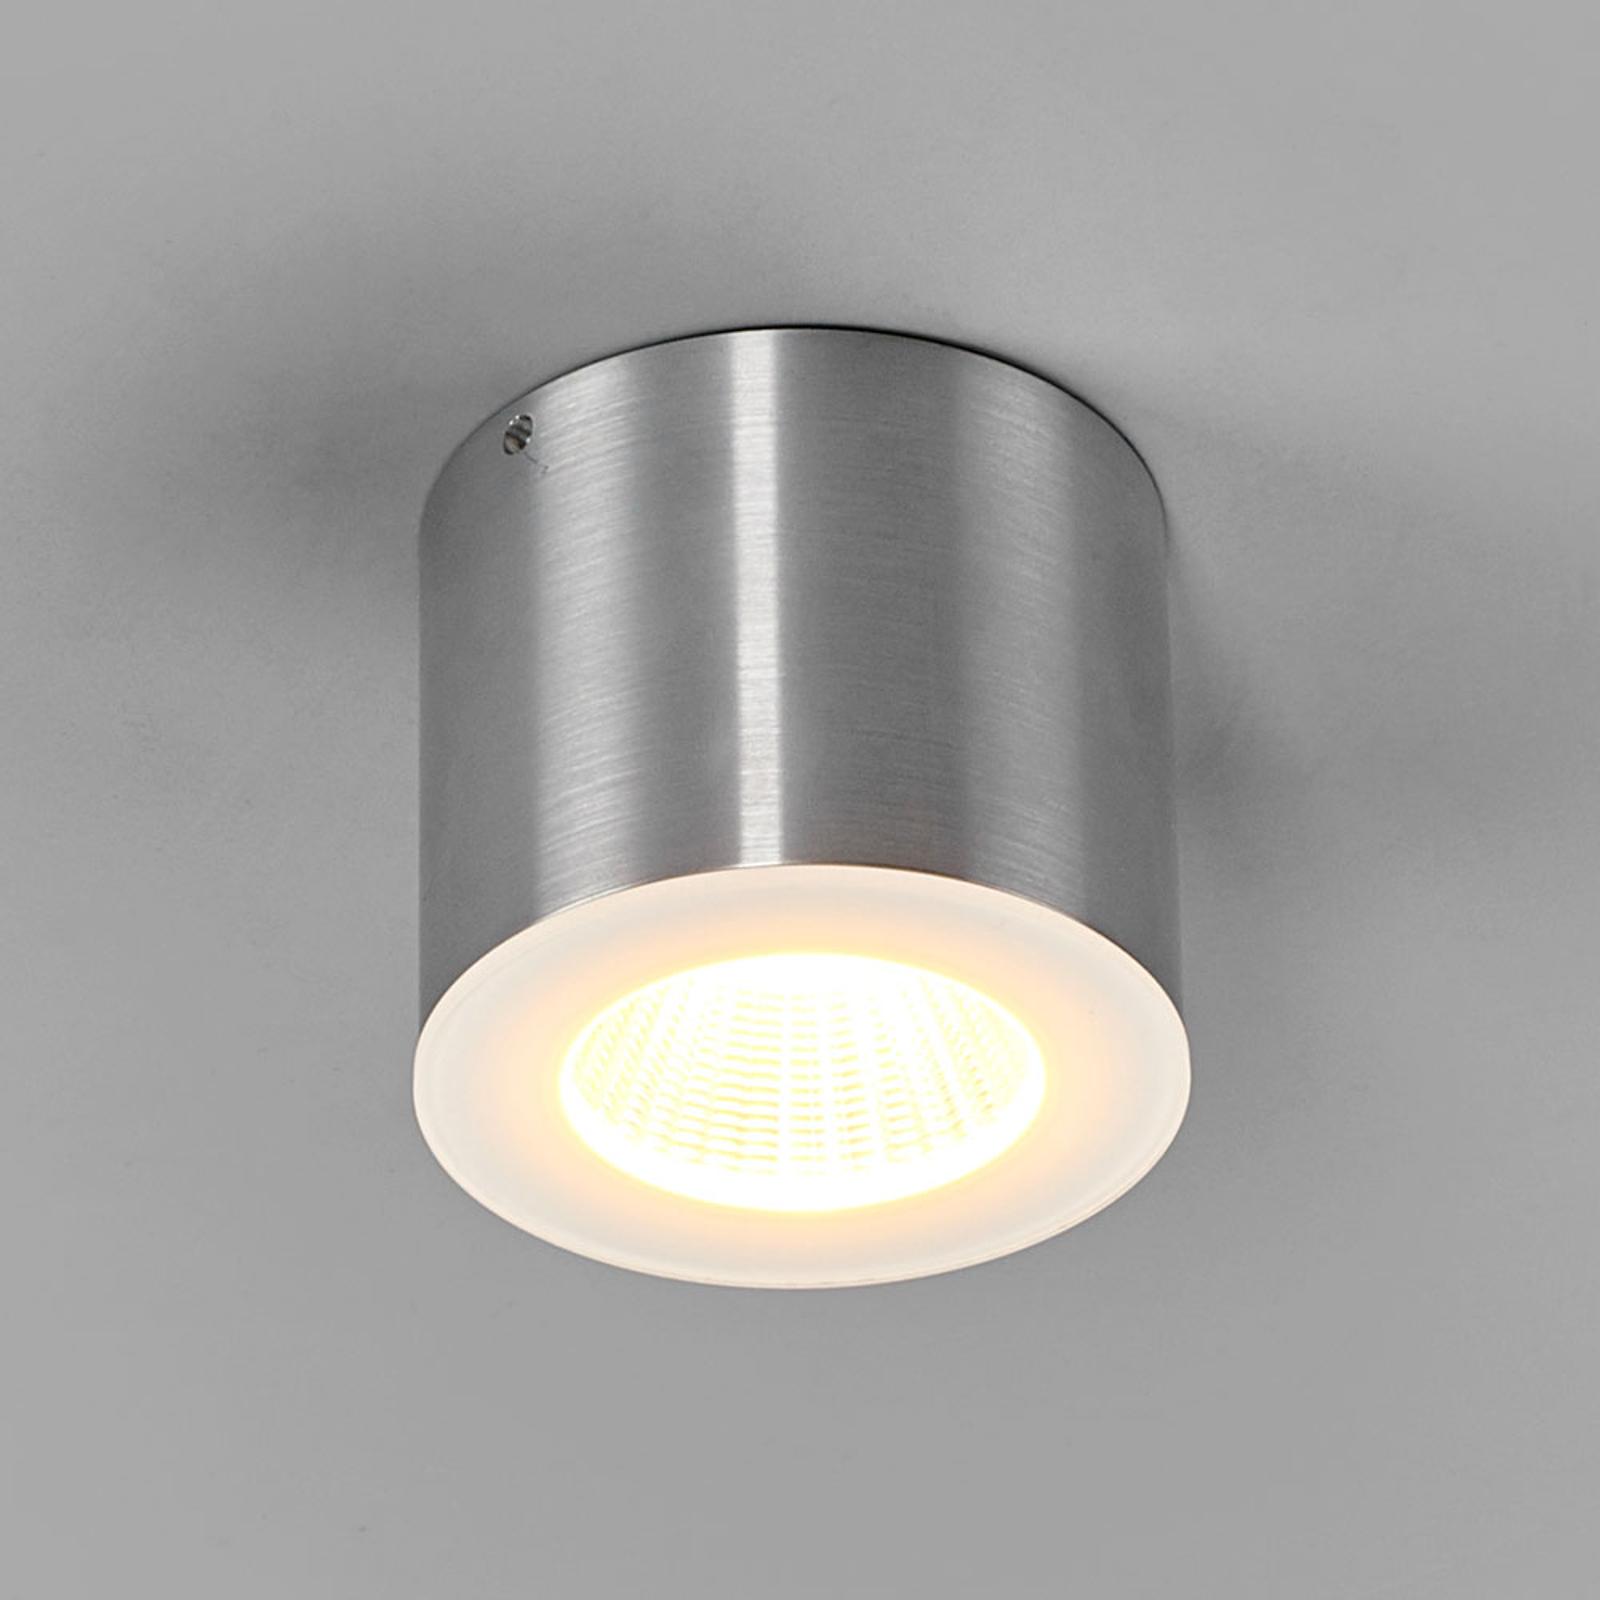 Helestra Oso foco de techo LED, redondo, aluminio